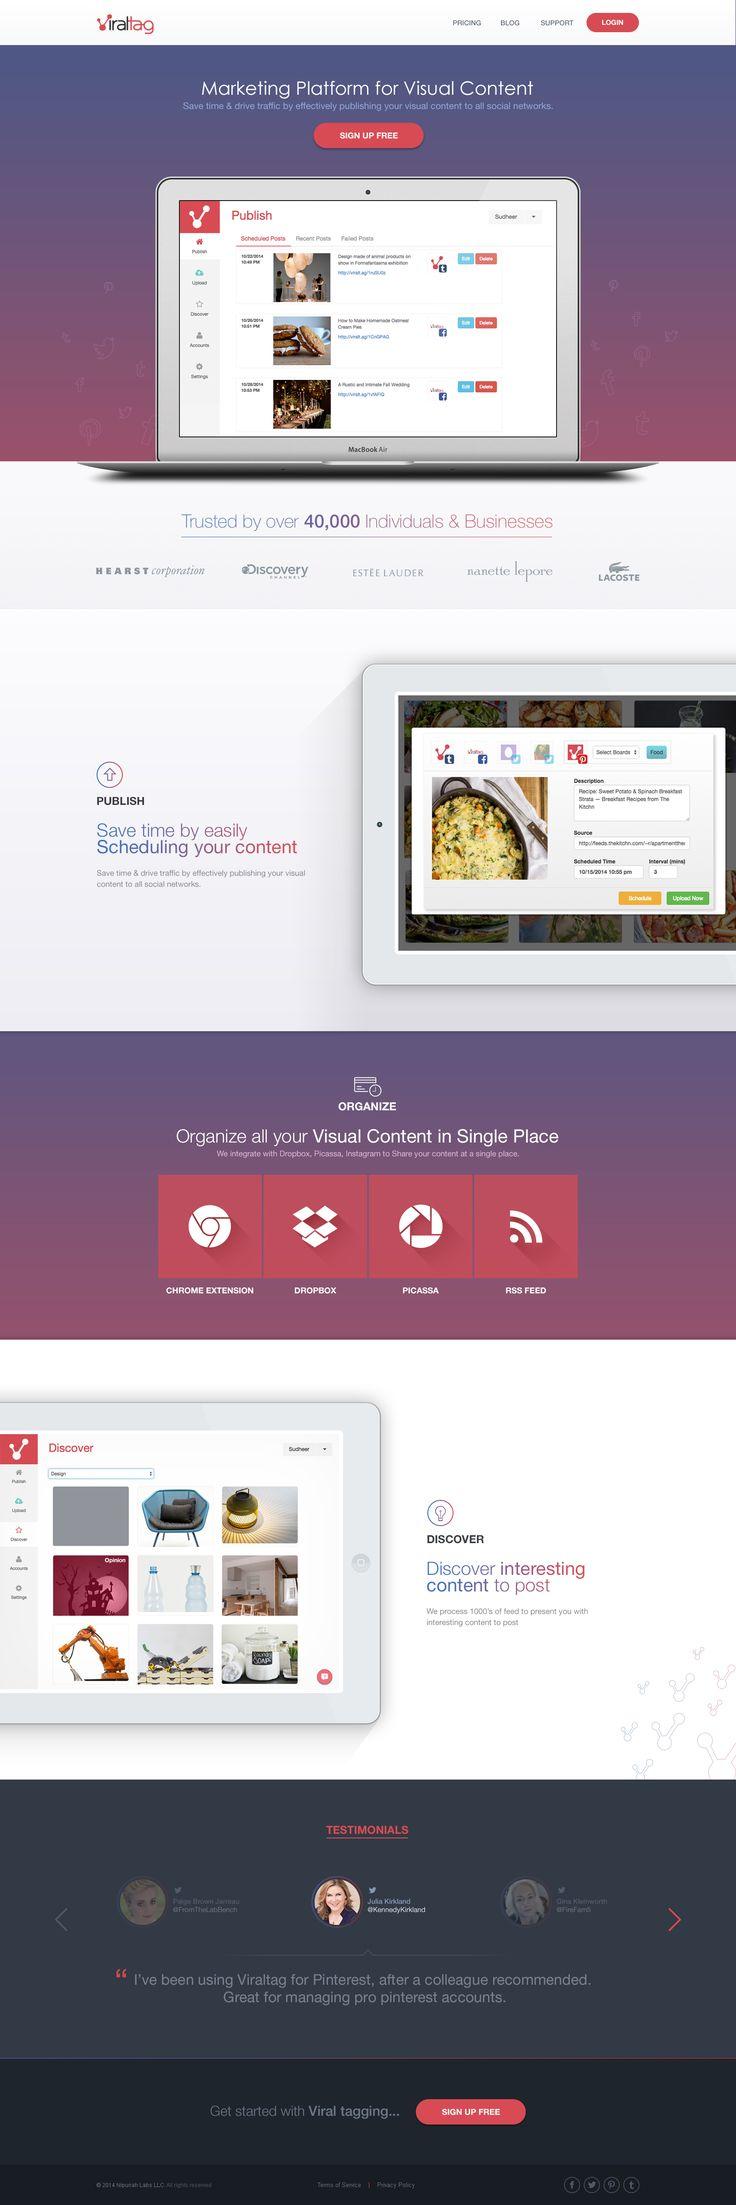 209 best Elegant User Interfaces (UI, UX, Design) images on ...